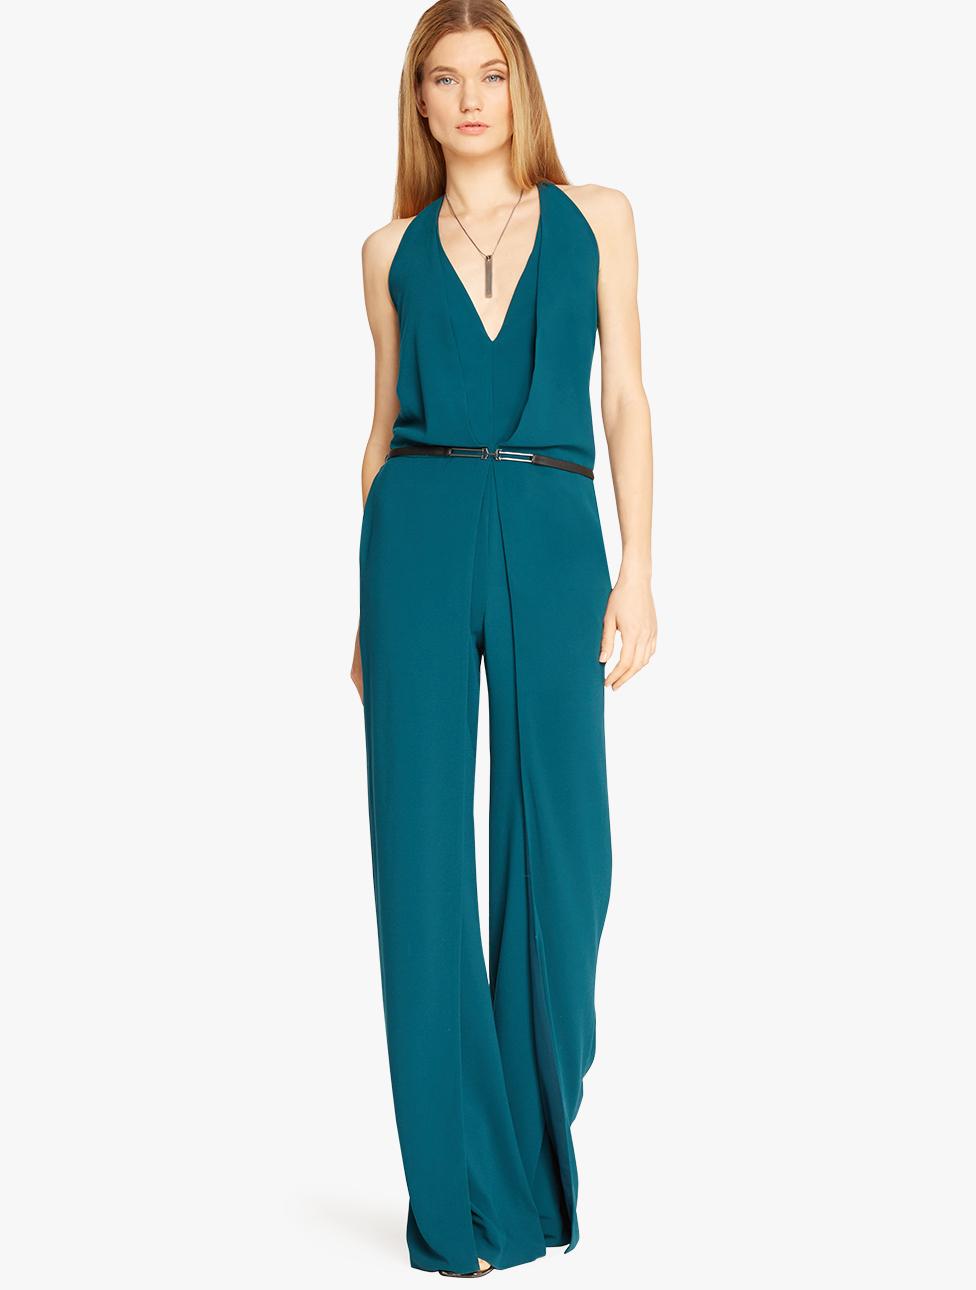 c6aa2b32904 Women s Blue Denim Flare Jumpsuit - Ecosia